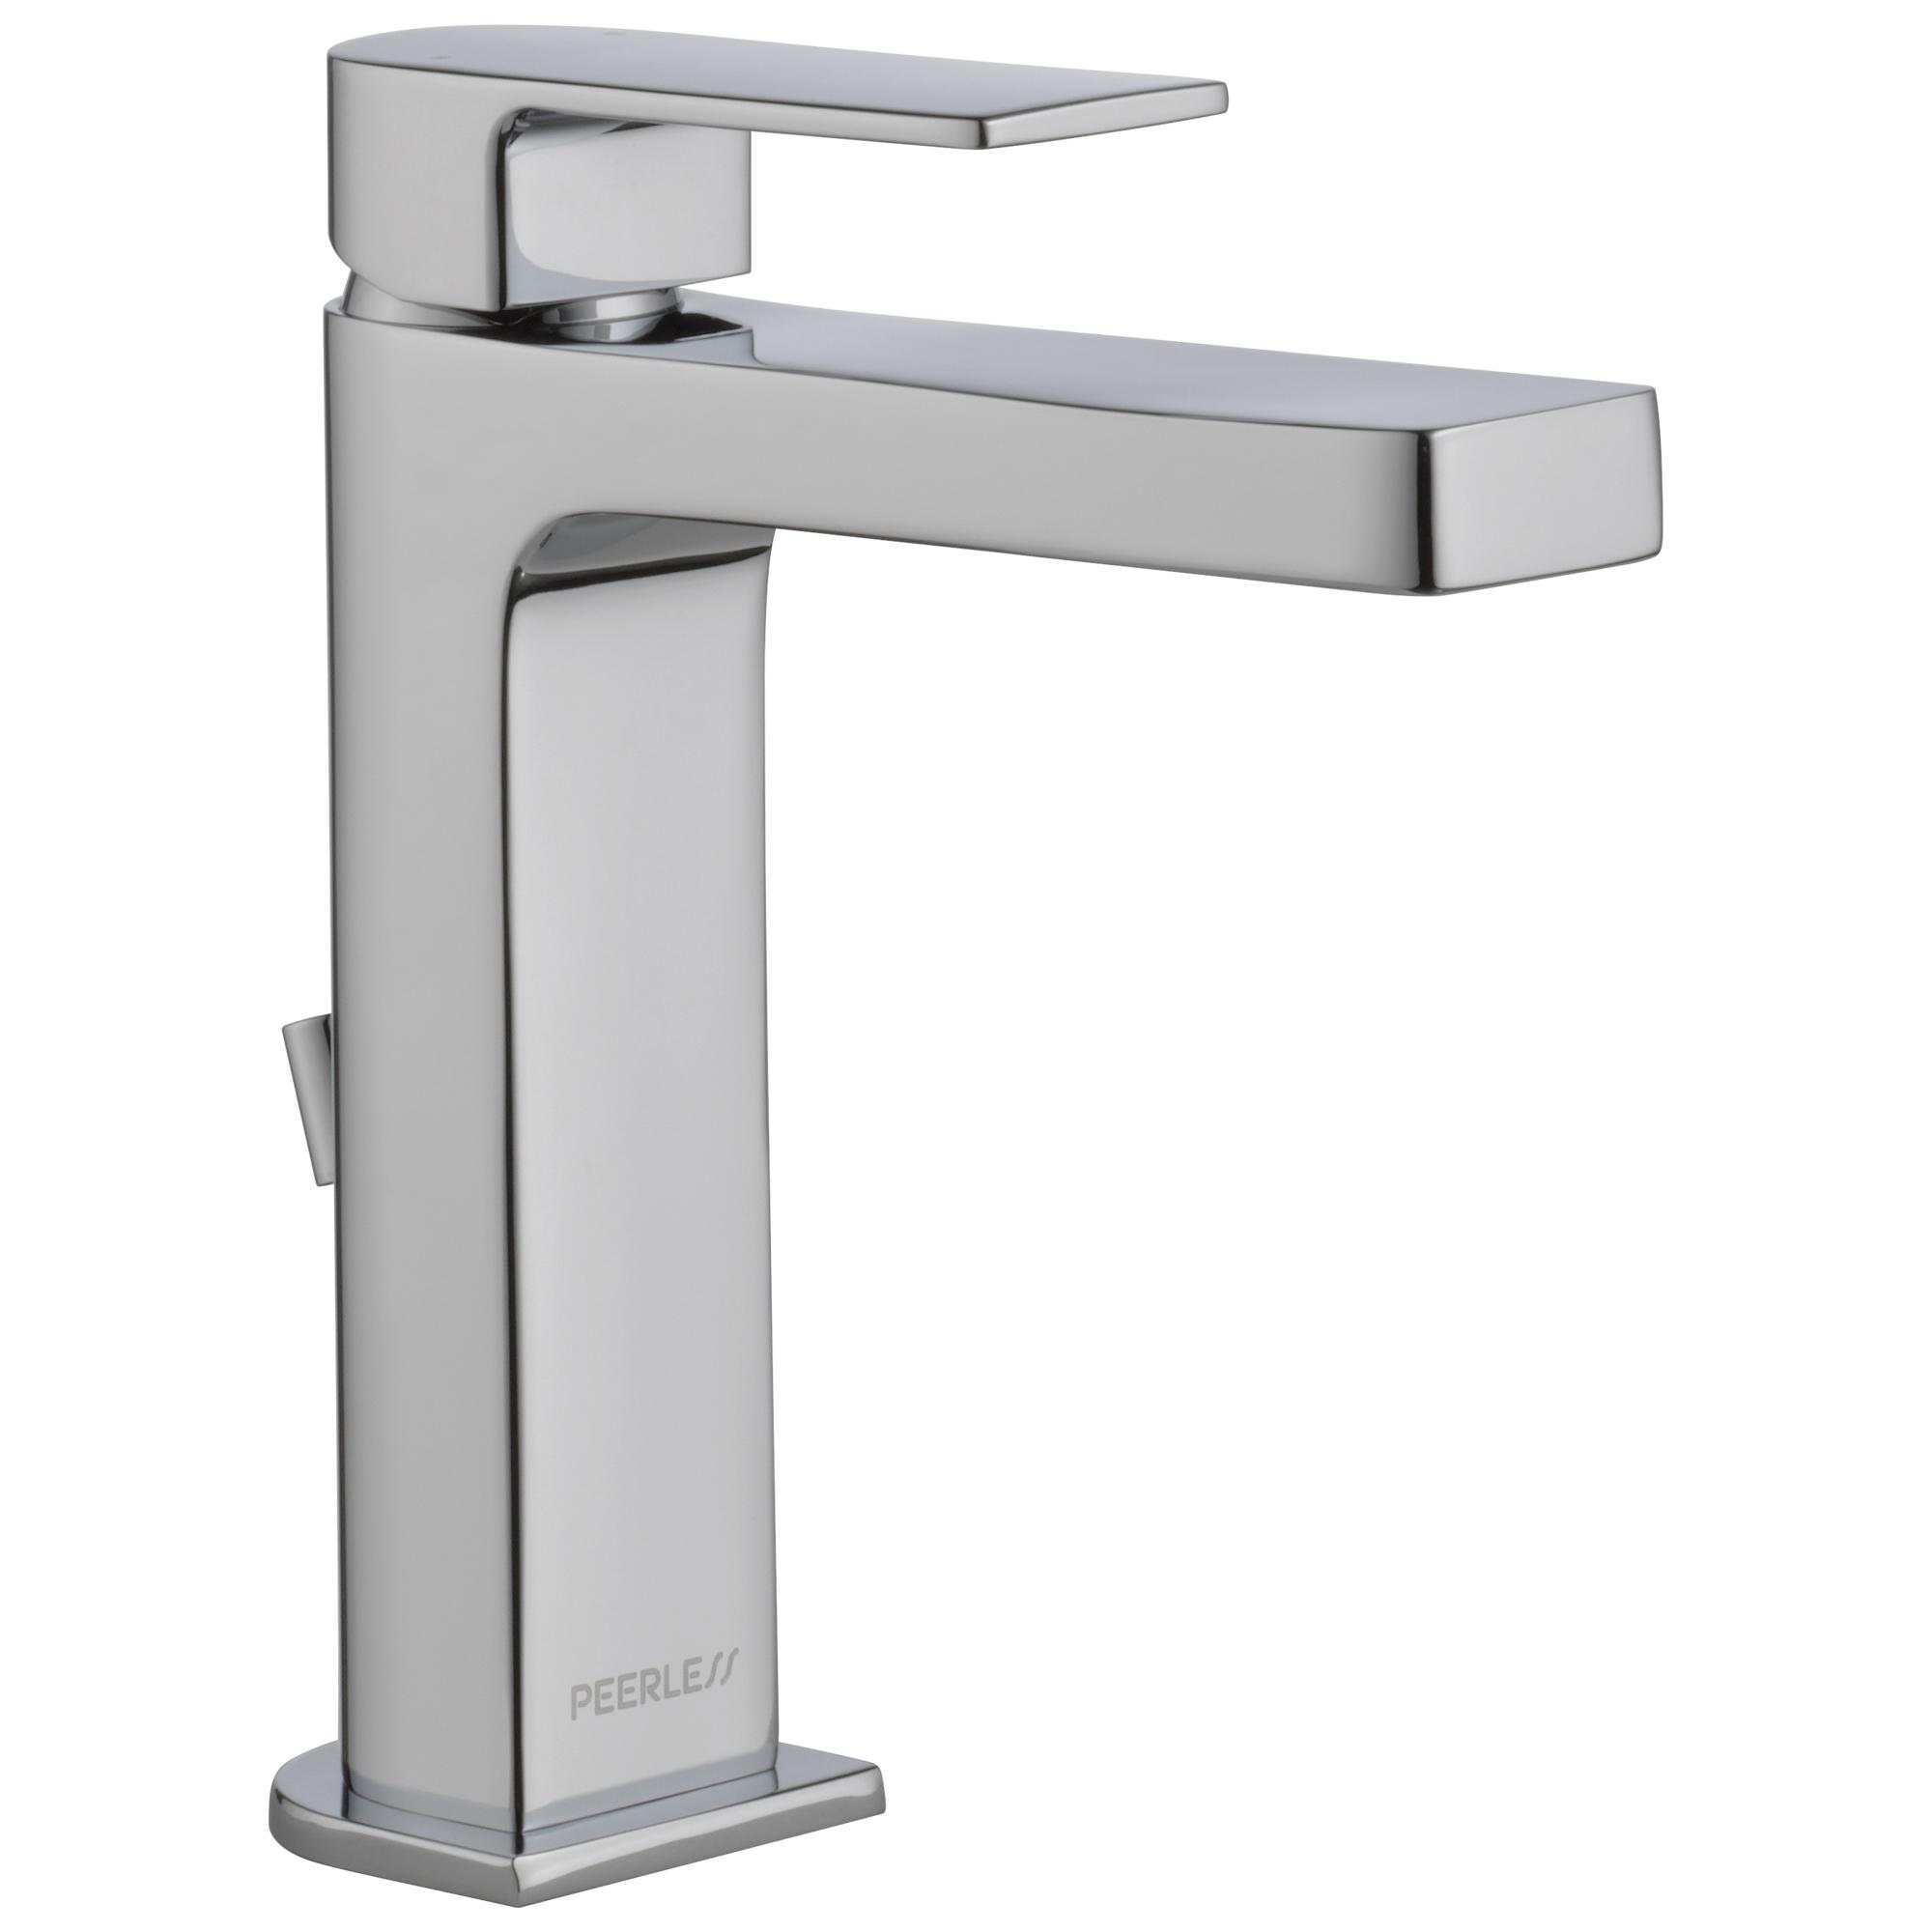 Peerless® P1519LF-HA Bathroom Faucet, Xander™, Chrome Plated, 1 Handles, 50/50 Pop-Up Drain, 1 gpm